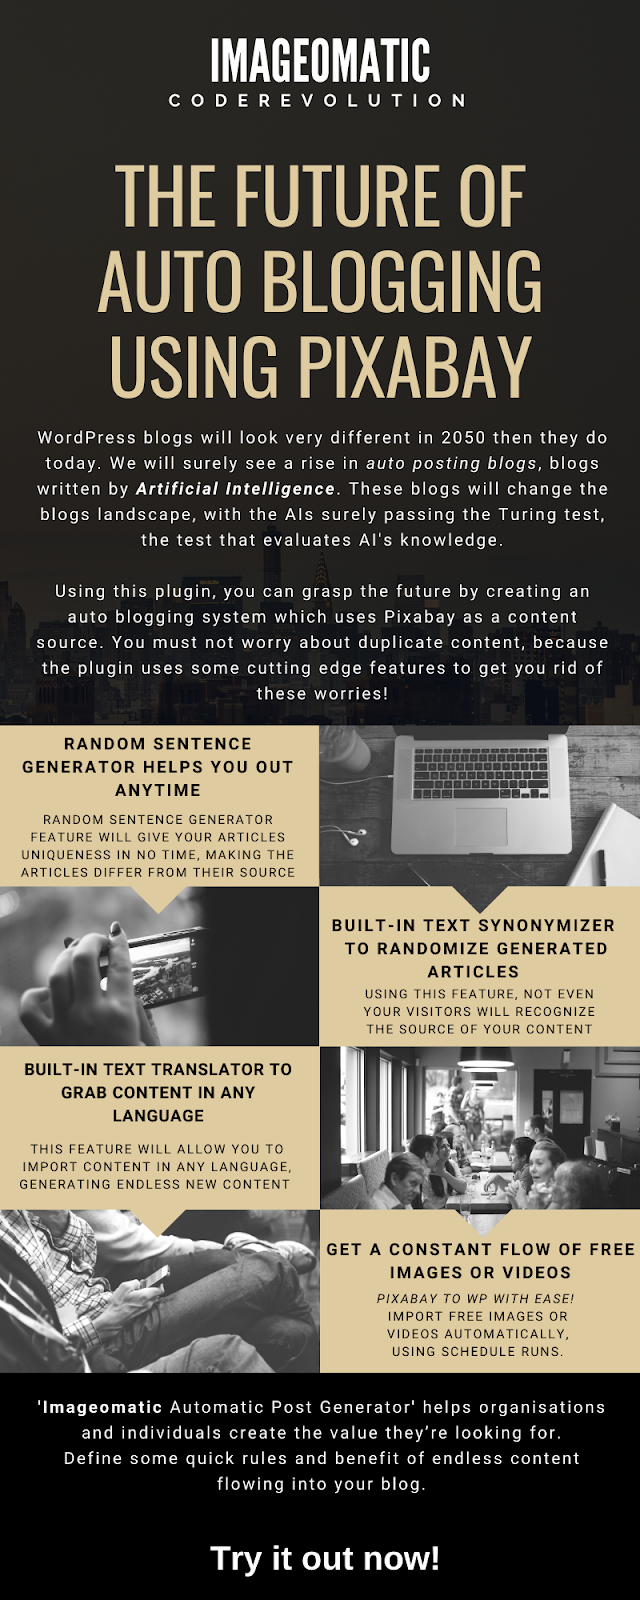 Imageomatic Royalty Free Image/Video Post Generator Plugin for WordPress